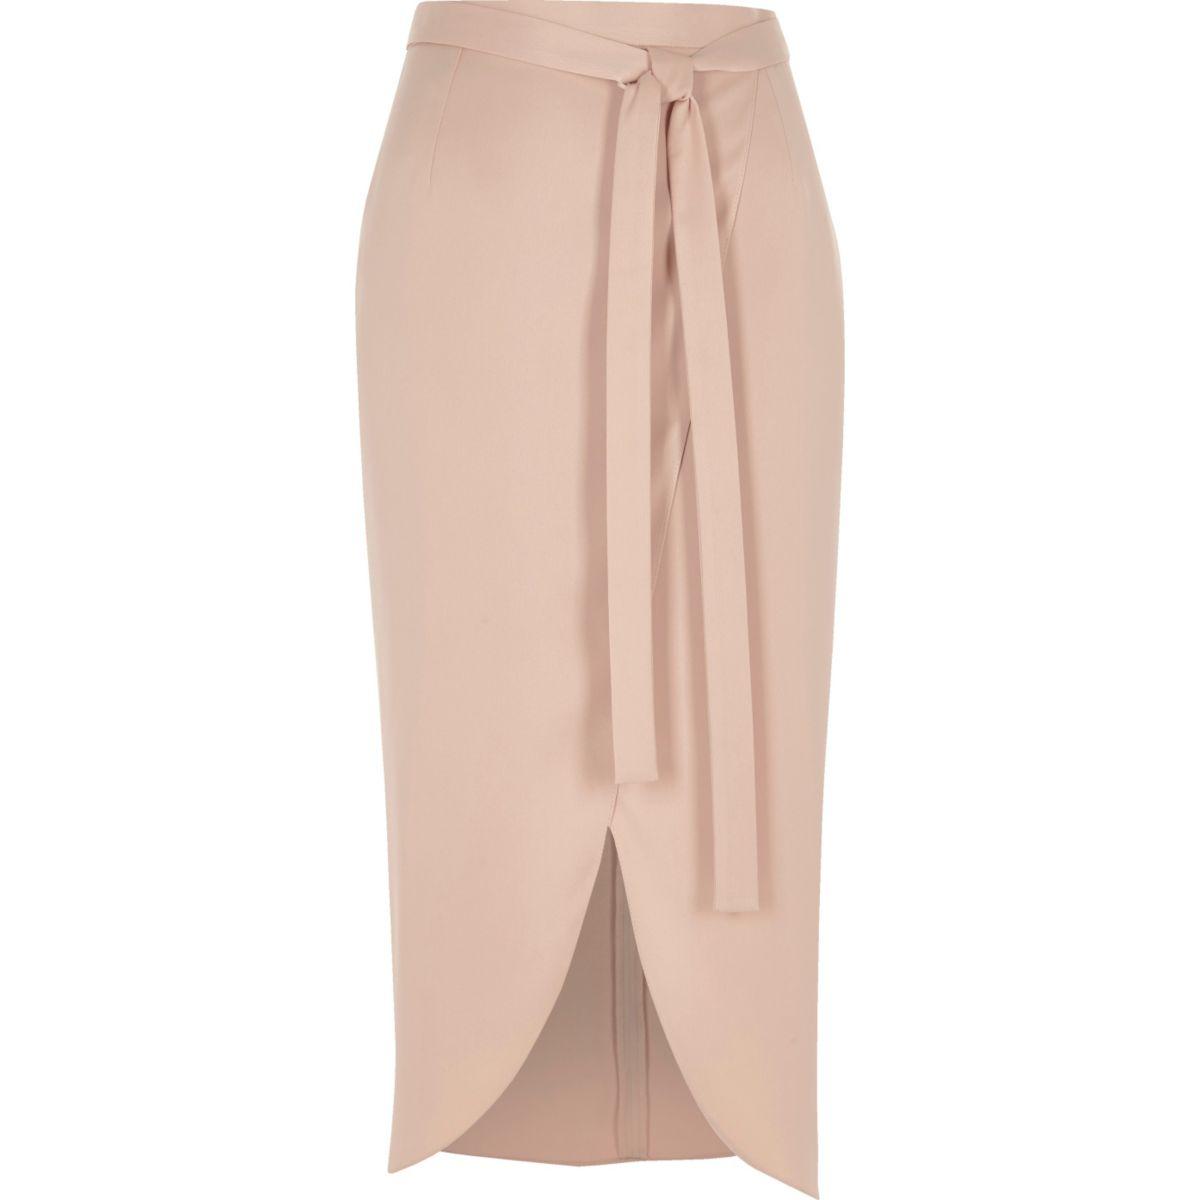 Light pink satin wrap midi skirt